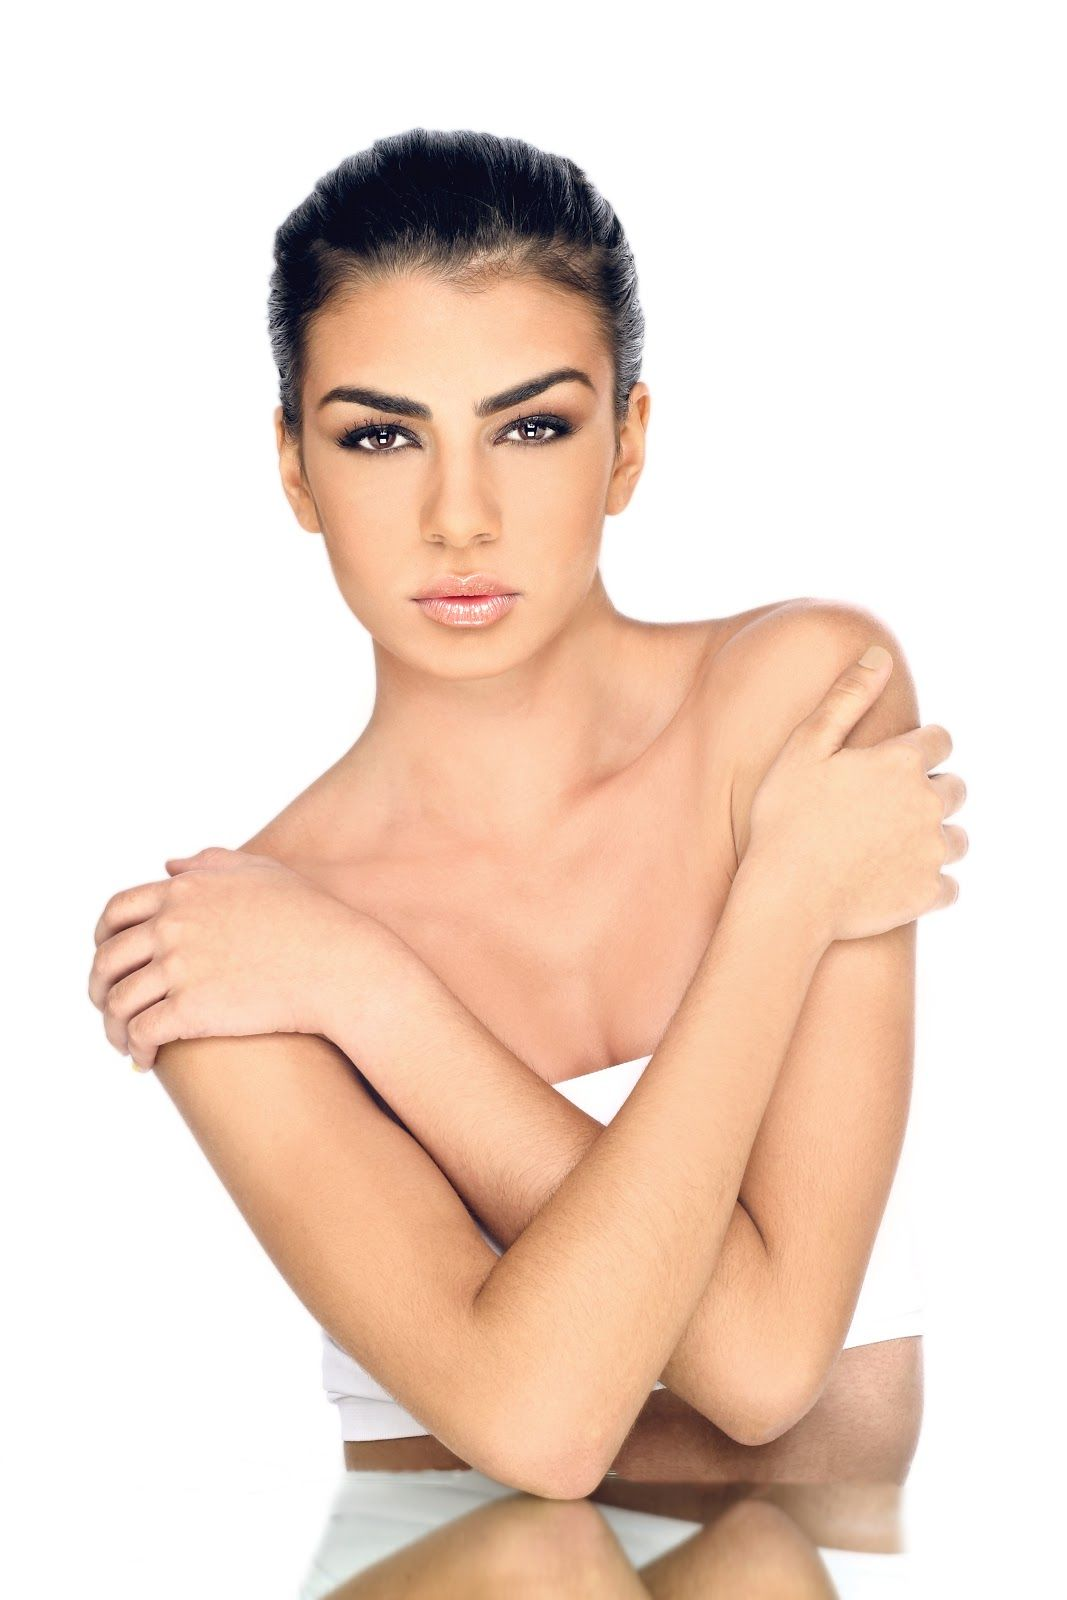 Photographer & Edit: Alberto Pérez Model: Alejandra Ramos Muñoz from Rimmel London Stylist: